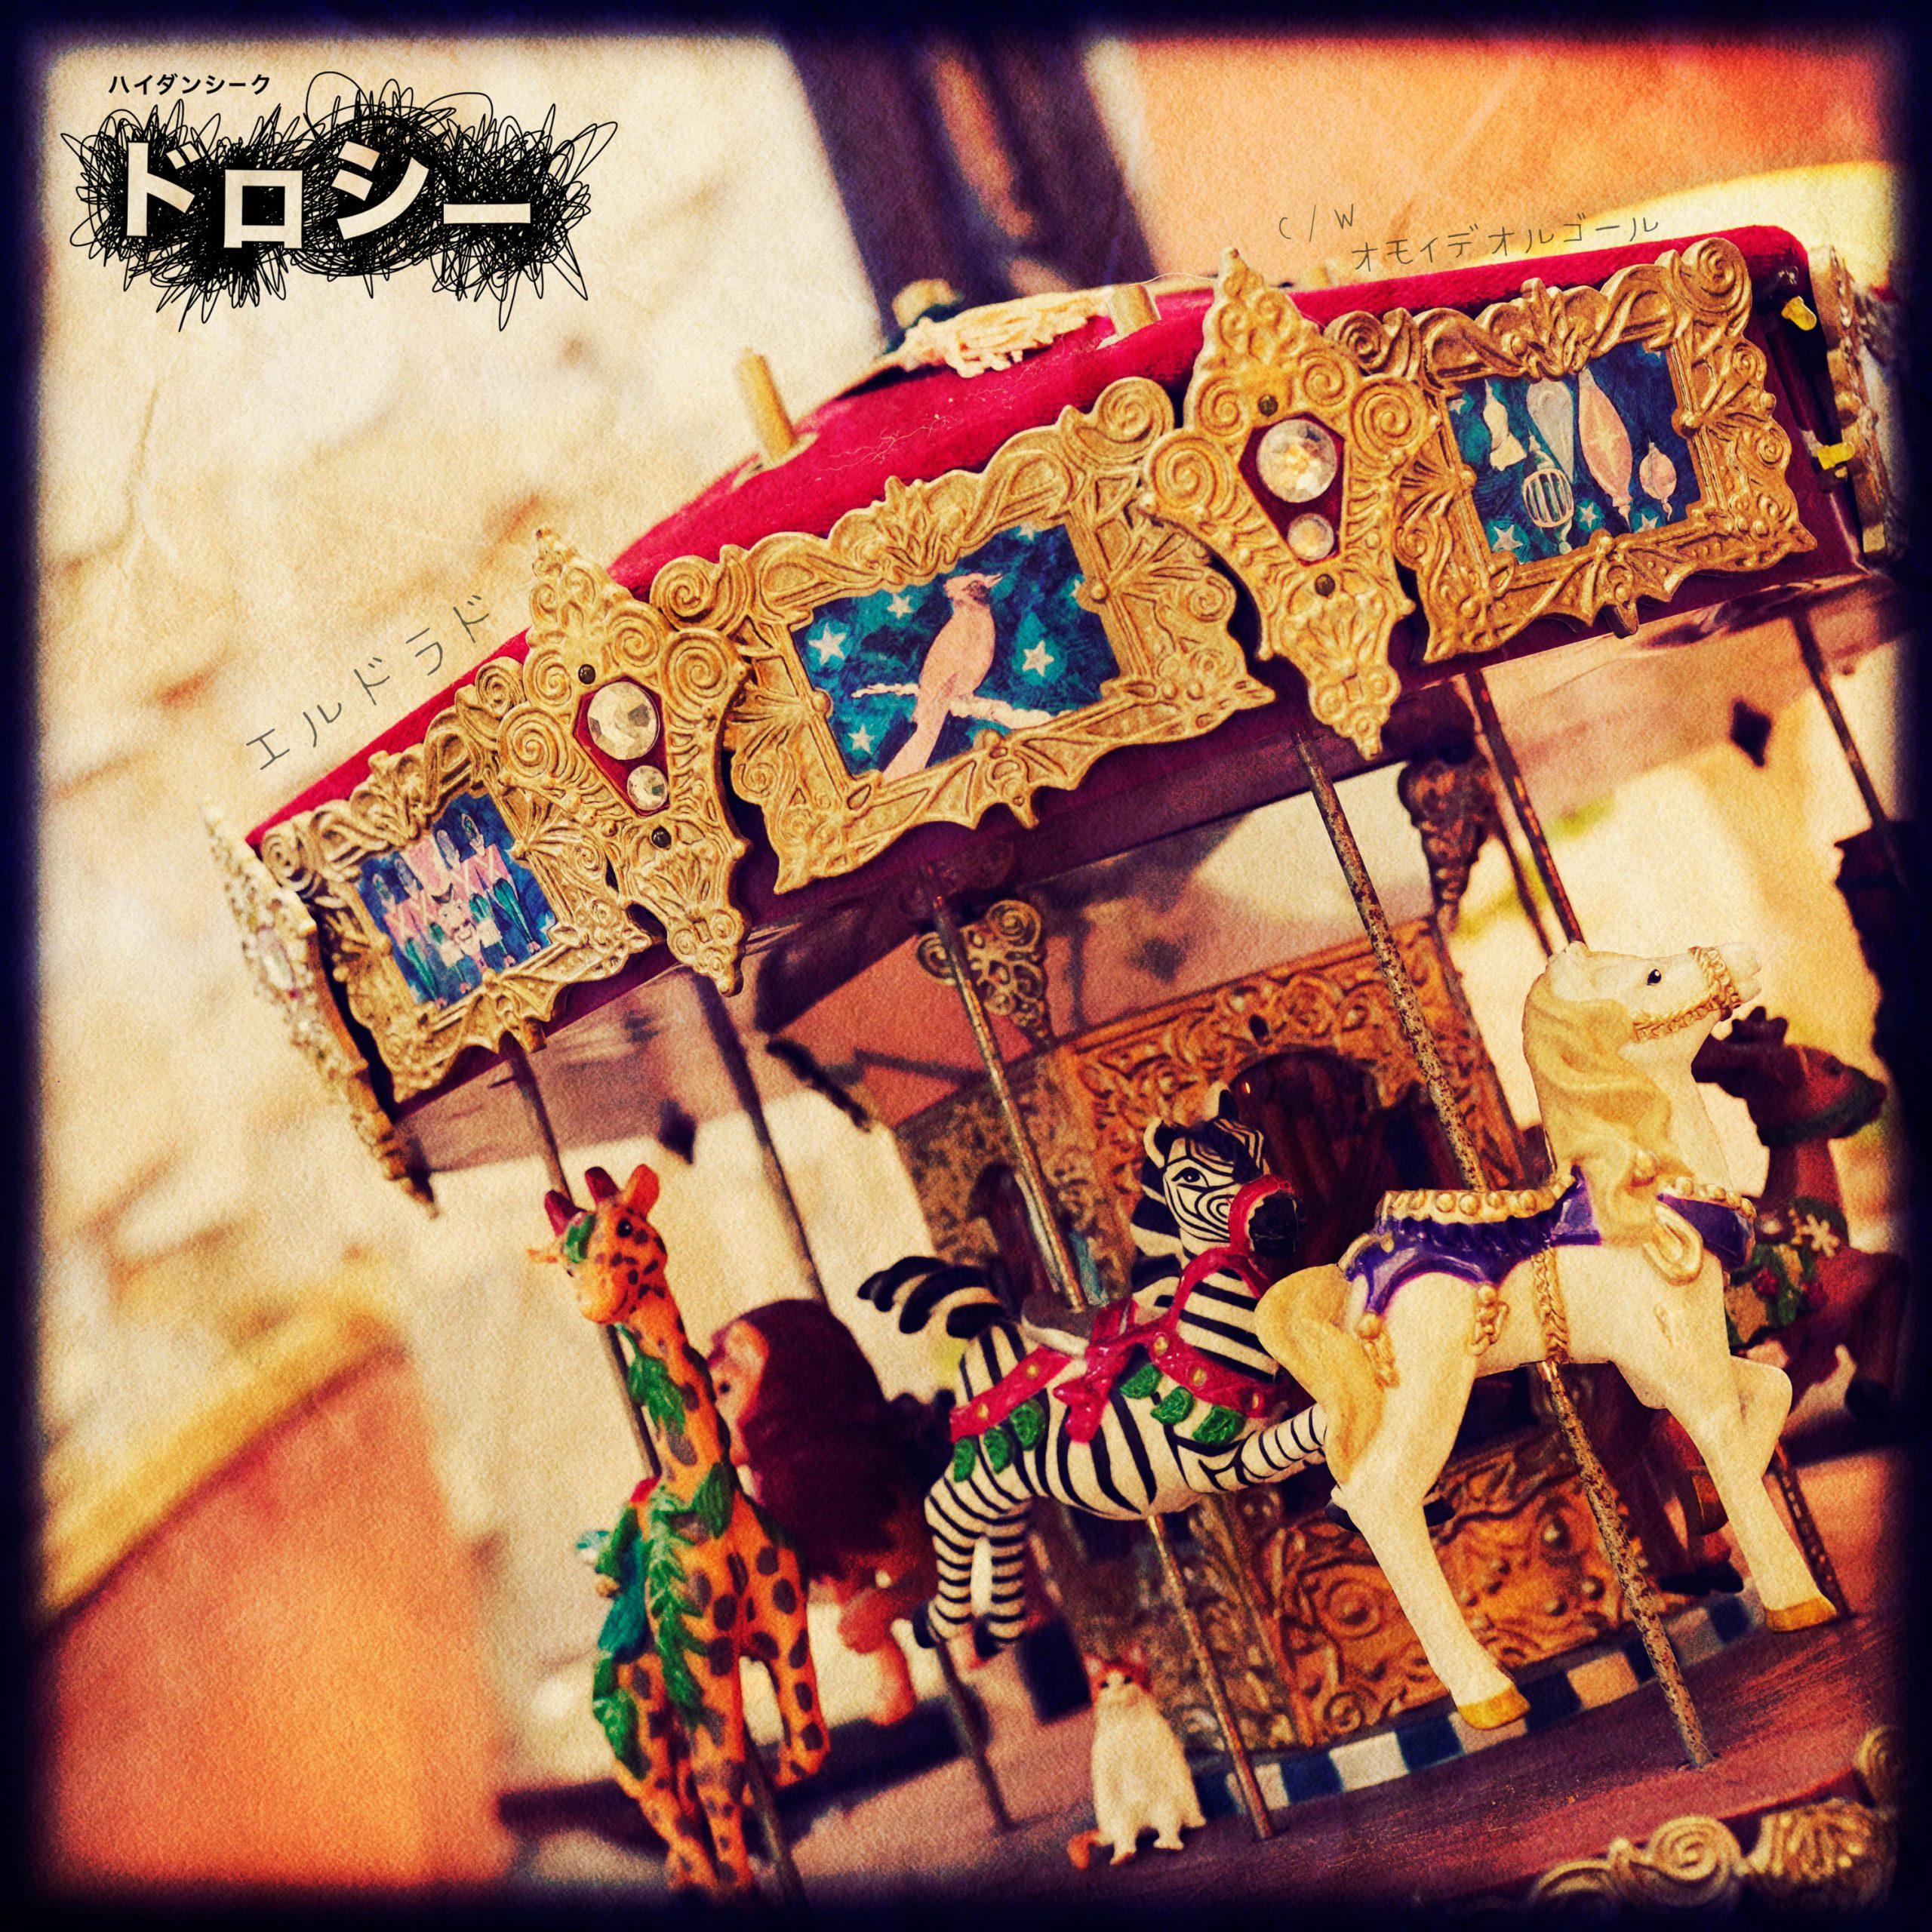 3rd digital single「エルドラド / オモイデオルゴール」